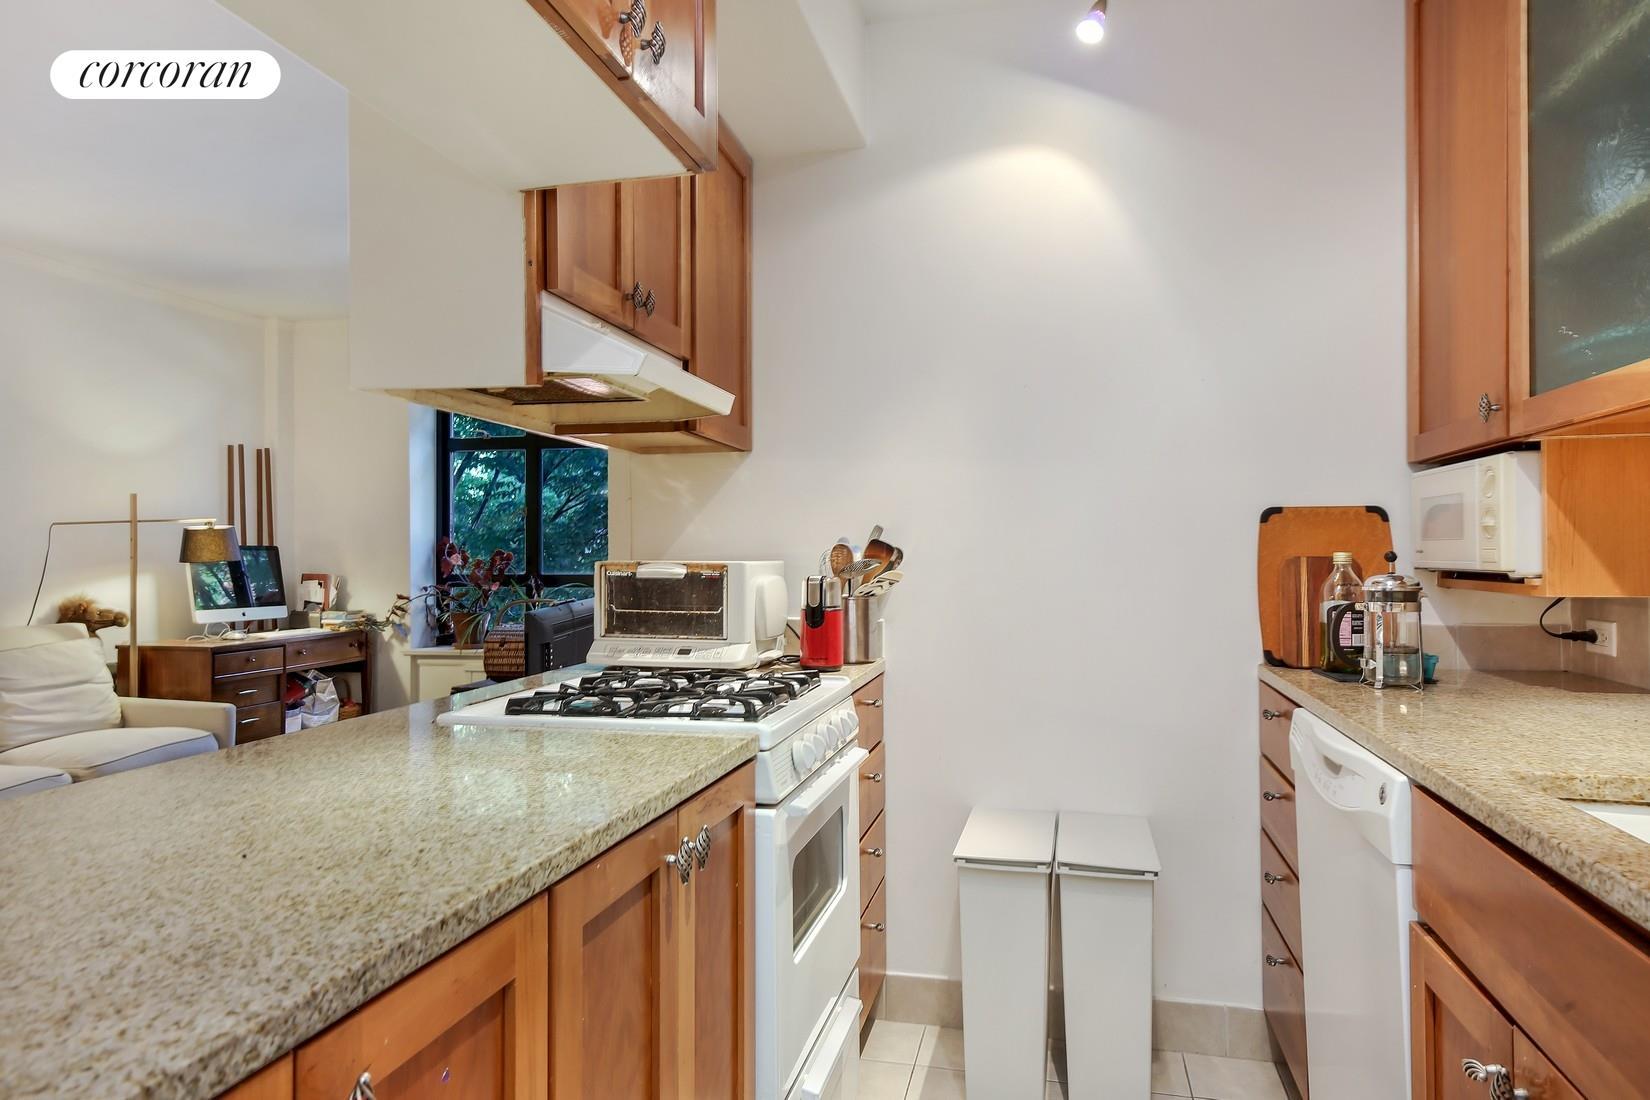 Apartment for sale at 100 Remsen Street, Apt 2J